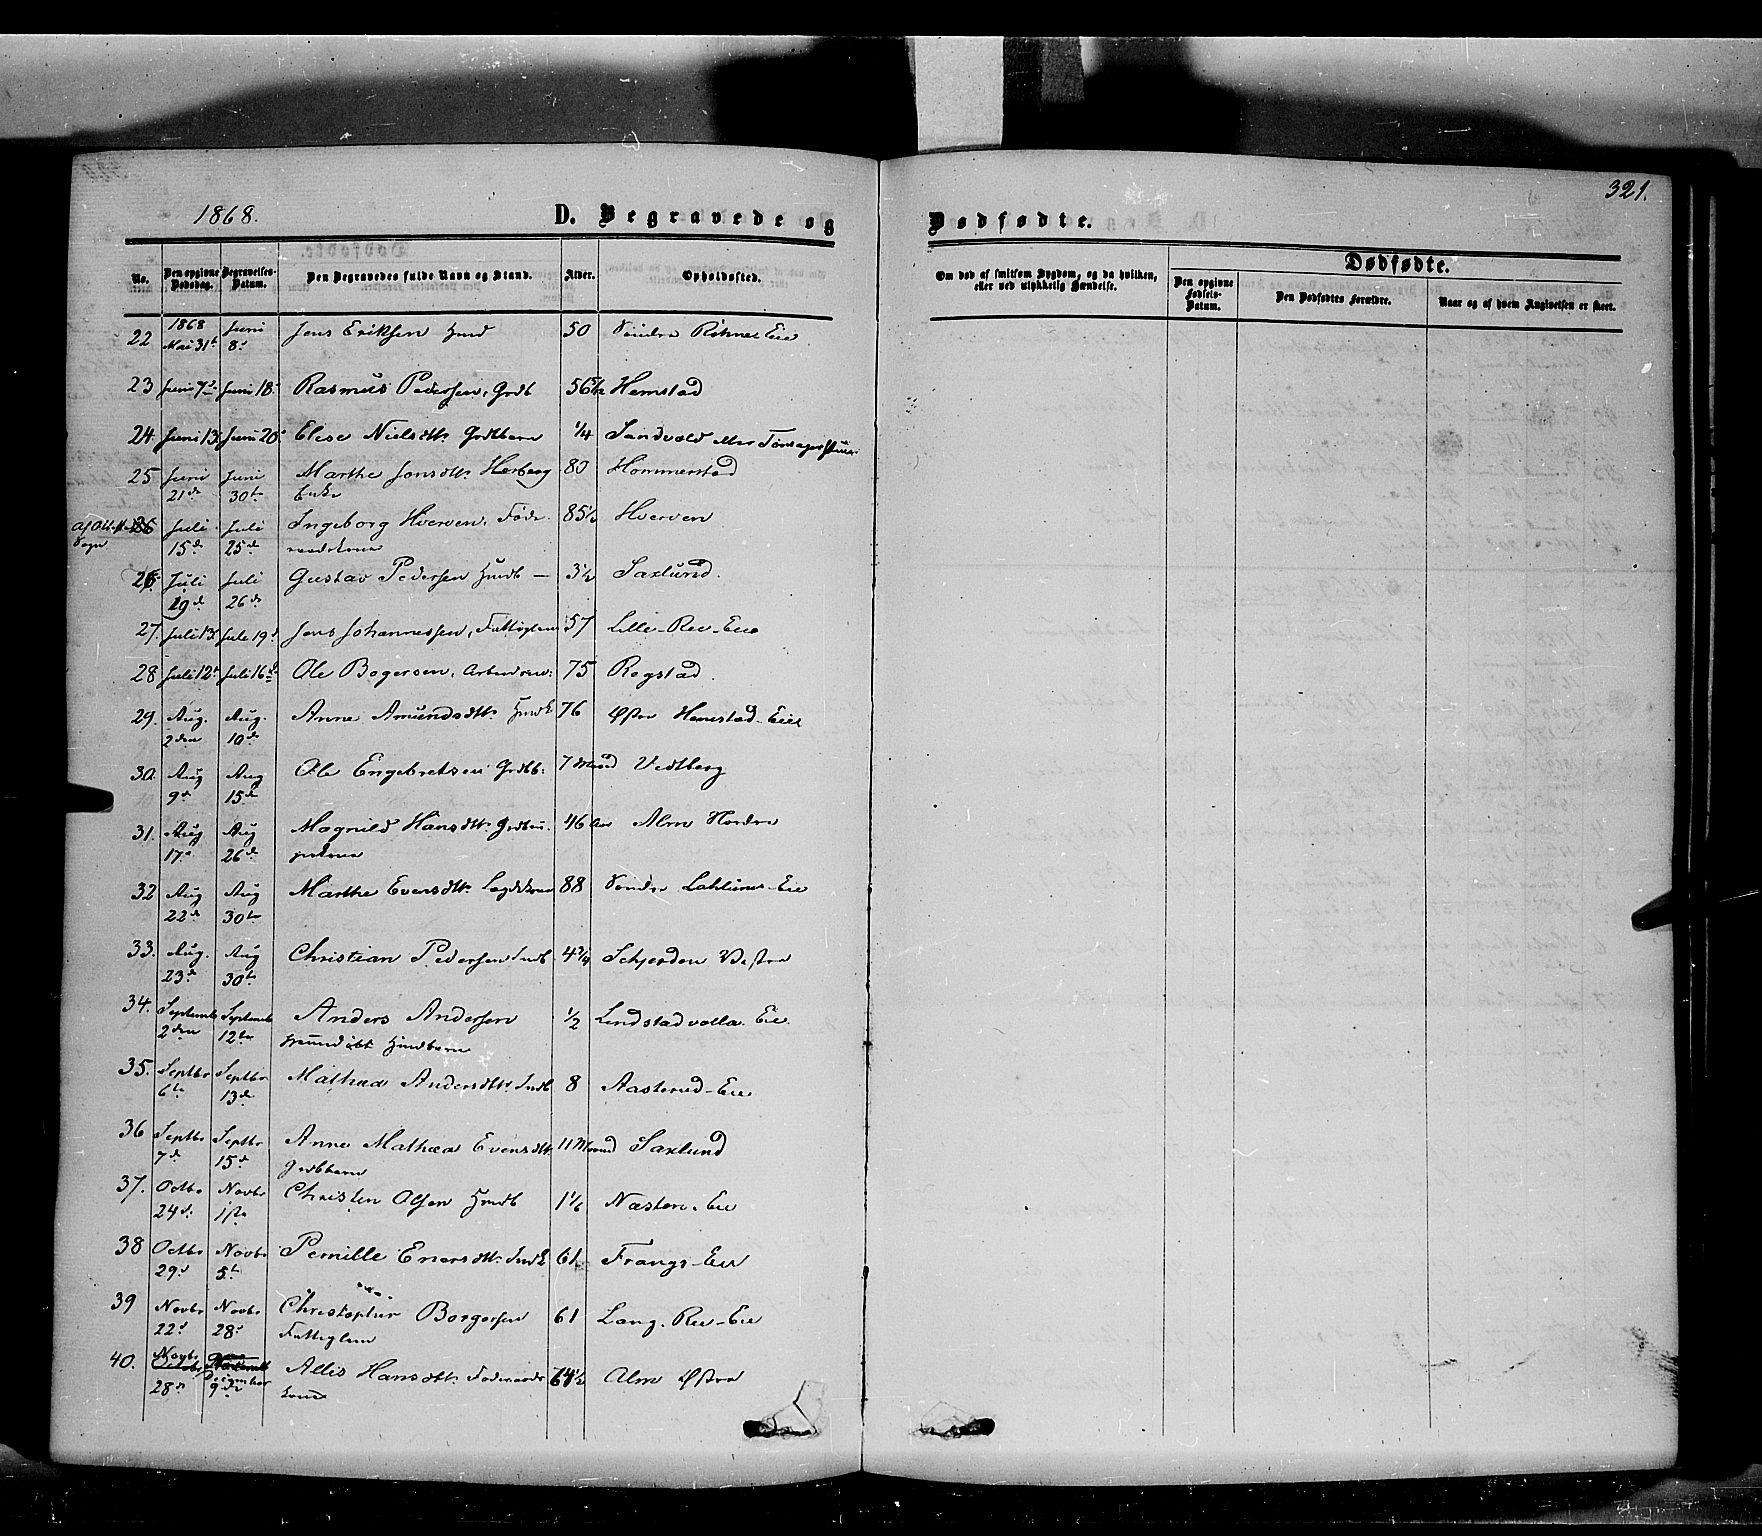 SAH, Stange prestekontor, K/L0013: Ministerialbok nr. 13, 1862-1879, s. 321